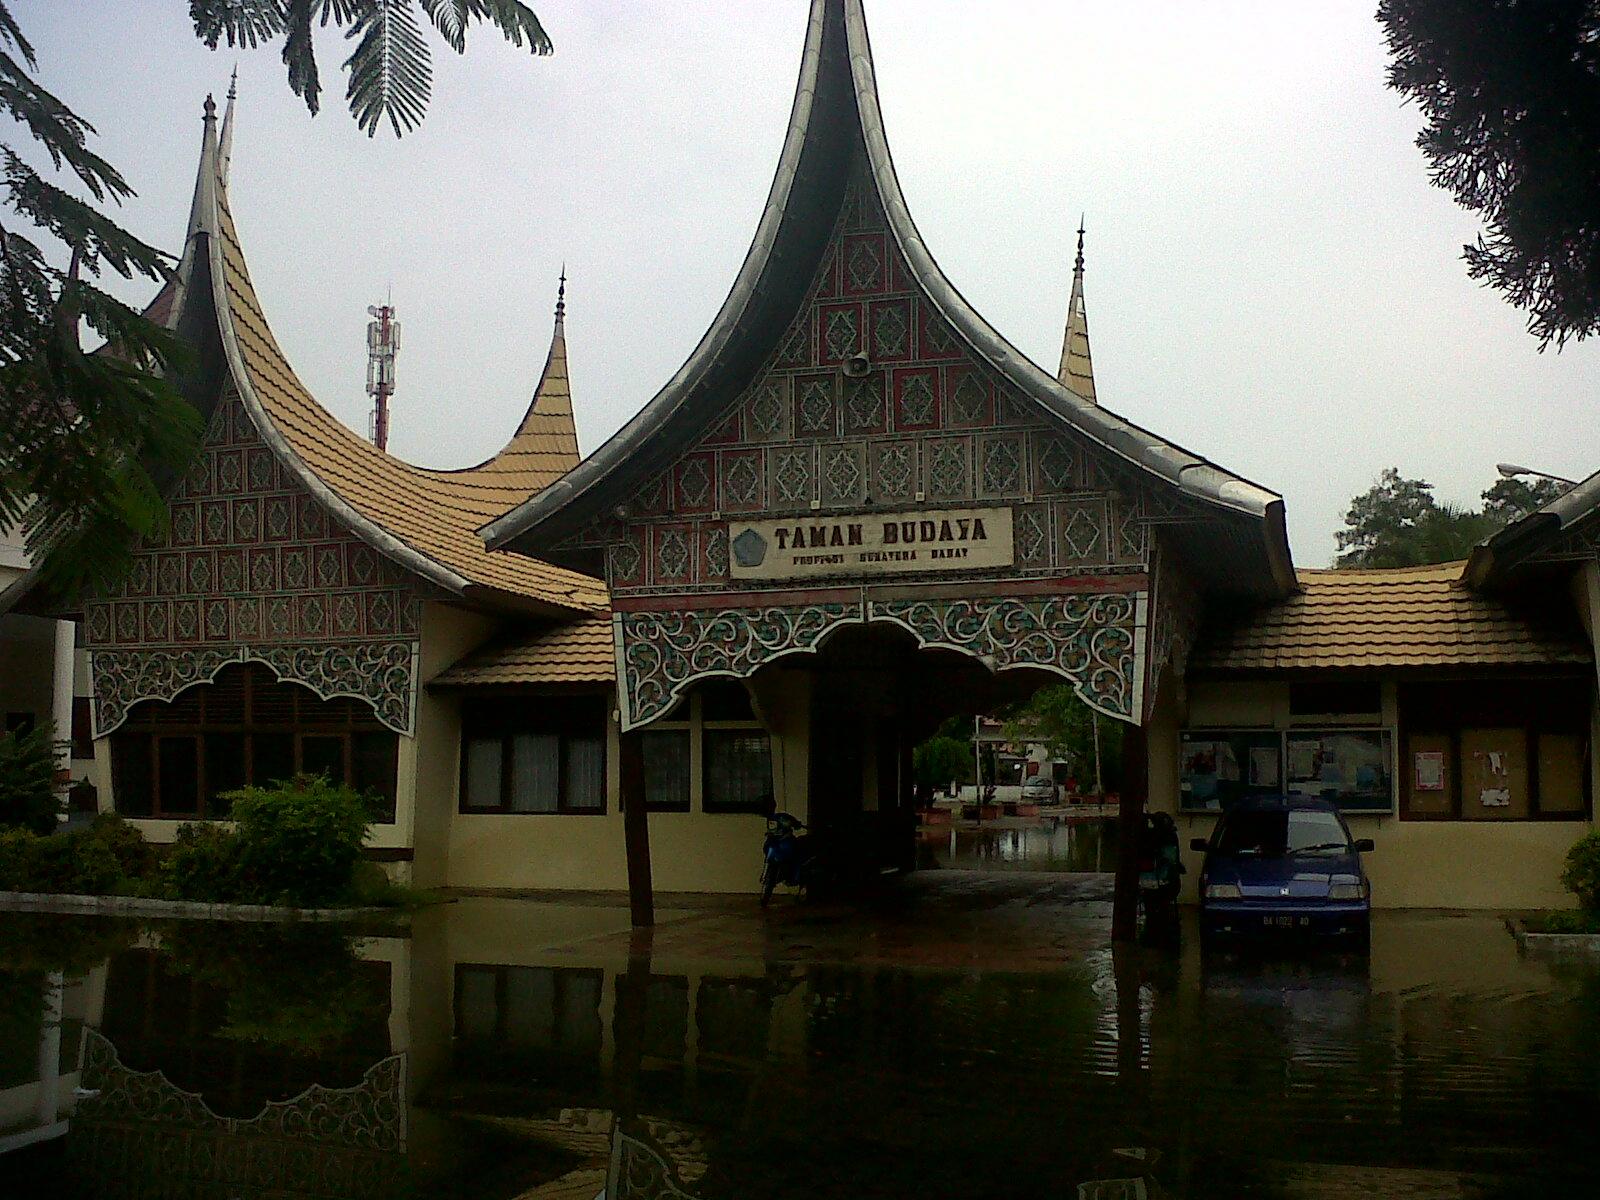 Minangtrip Museum Adityawarman Monumen Gempa Padang Kesan Tralalaaa Dimana Aditiawarmaaan